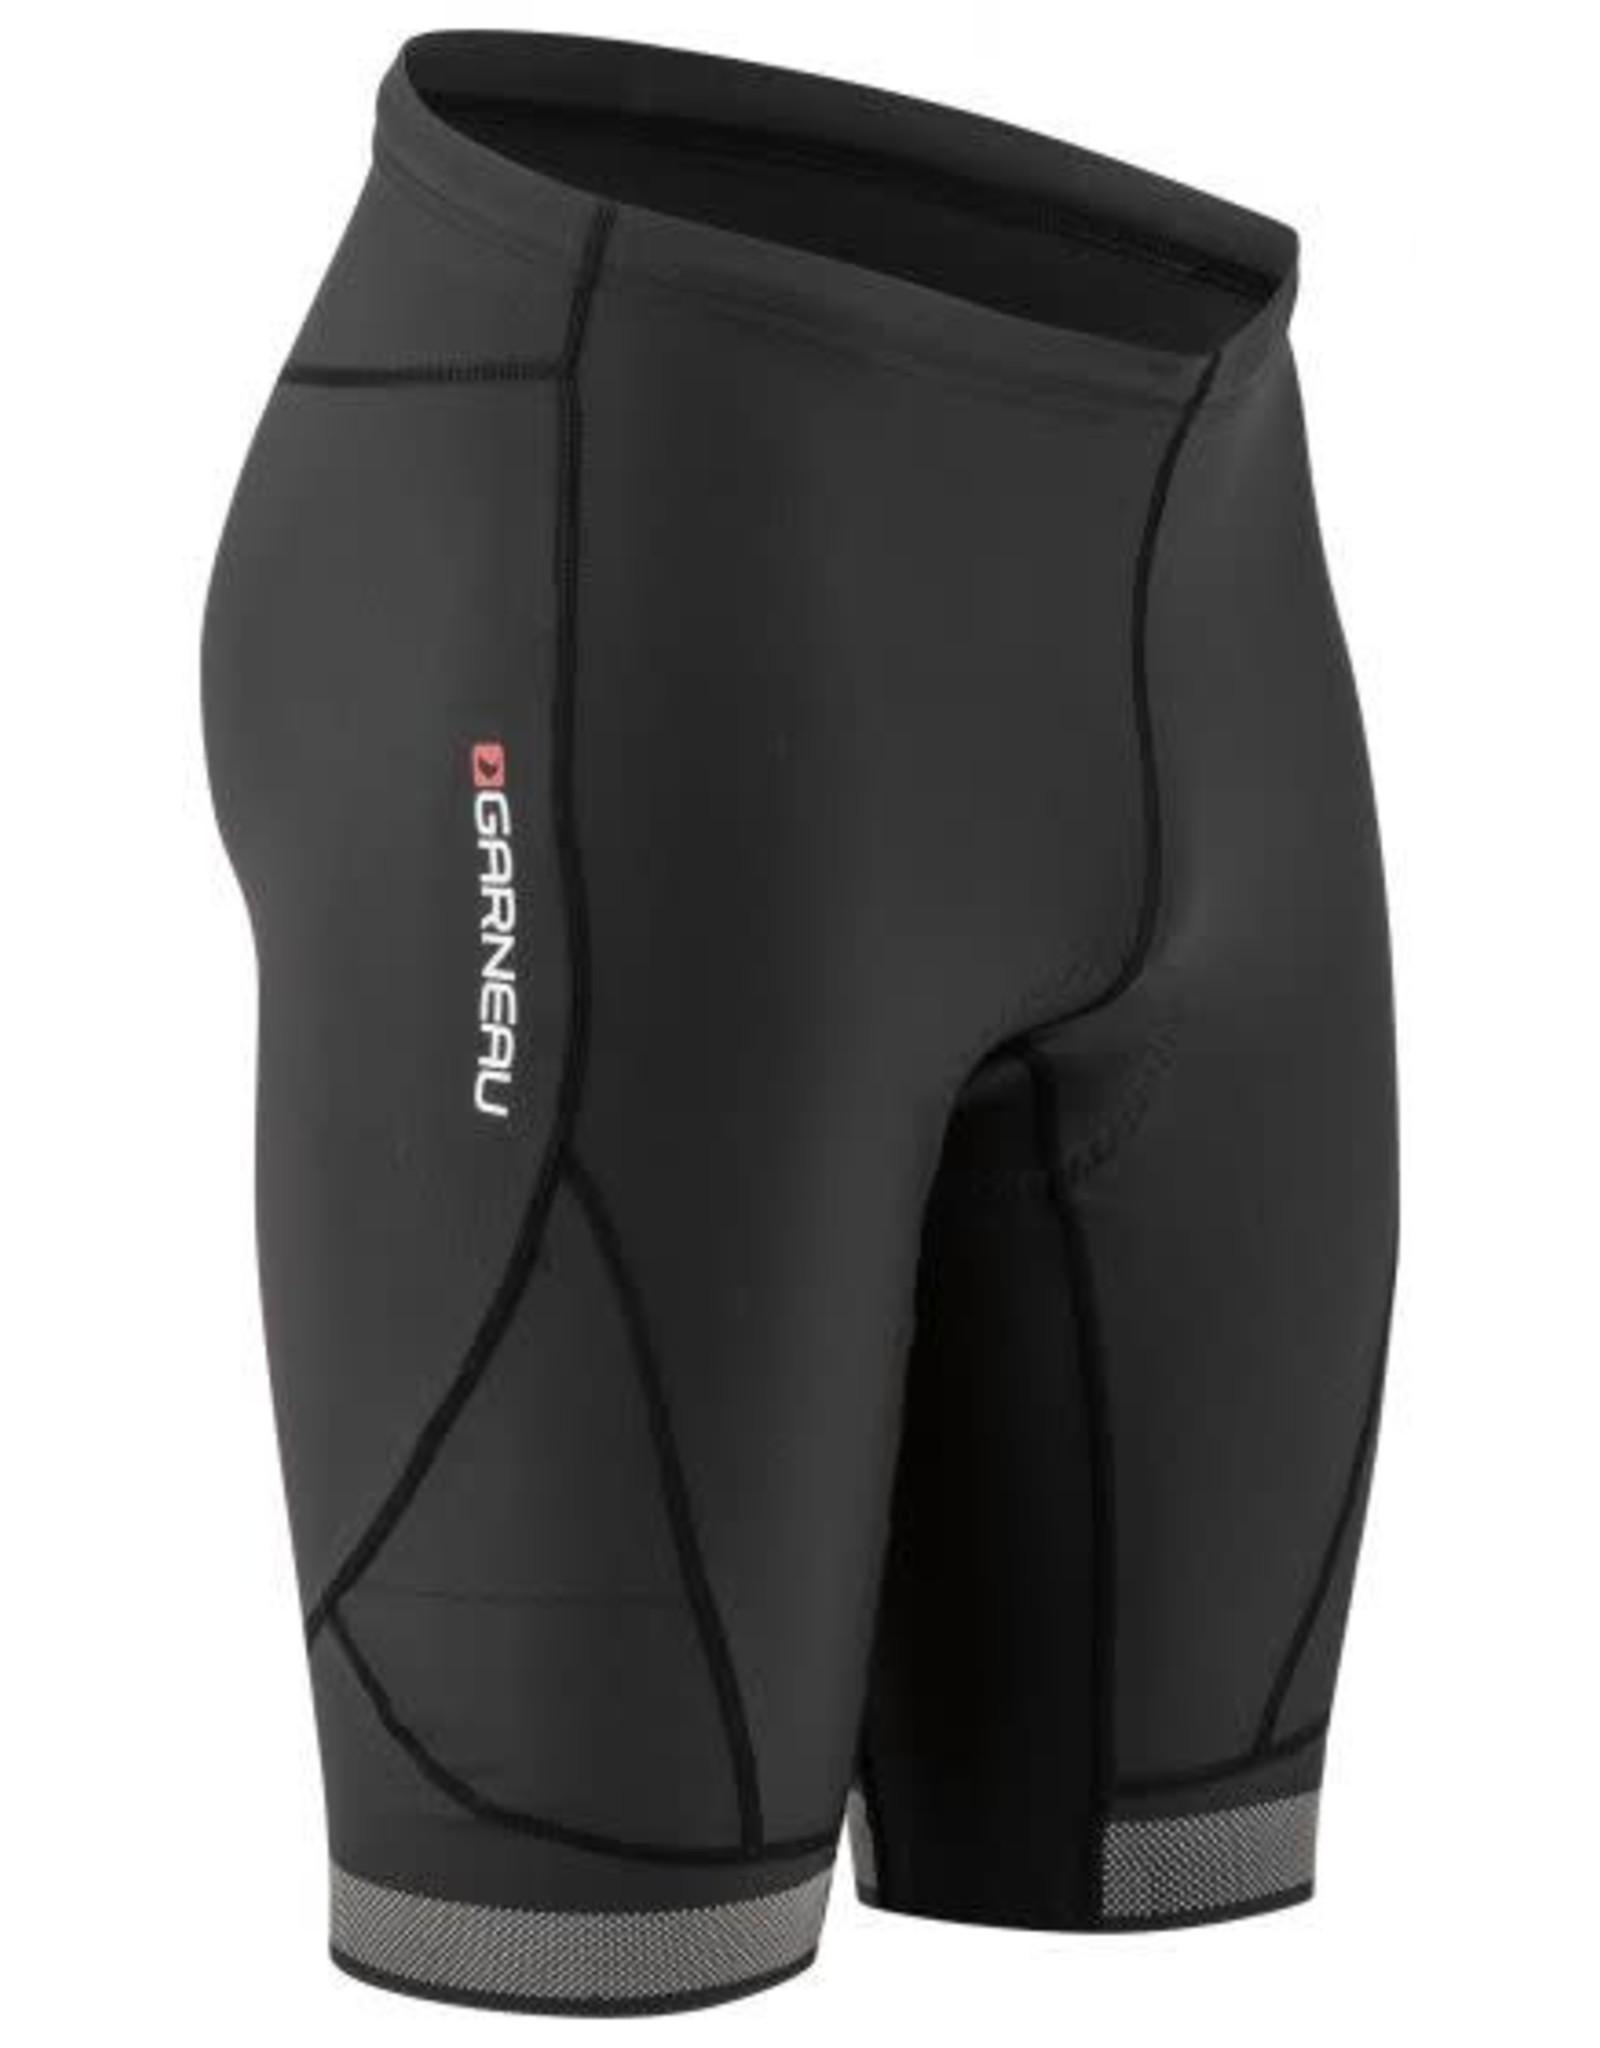 Garneau GARNEAU M CB Neo Power Shorts S19